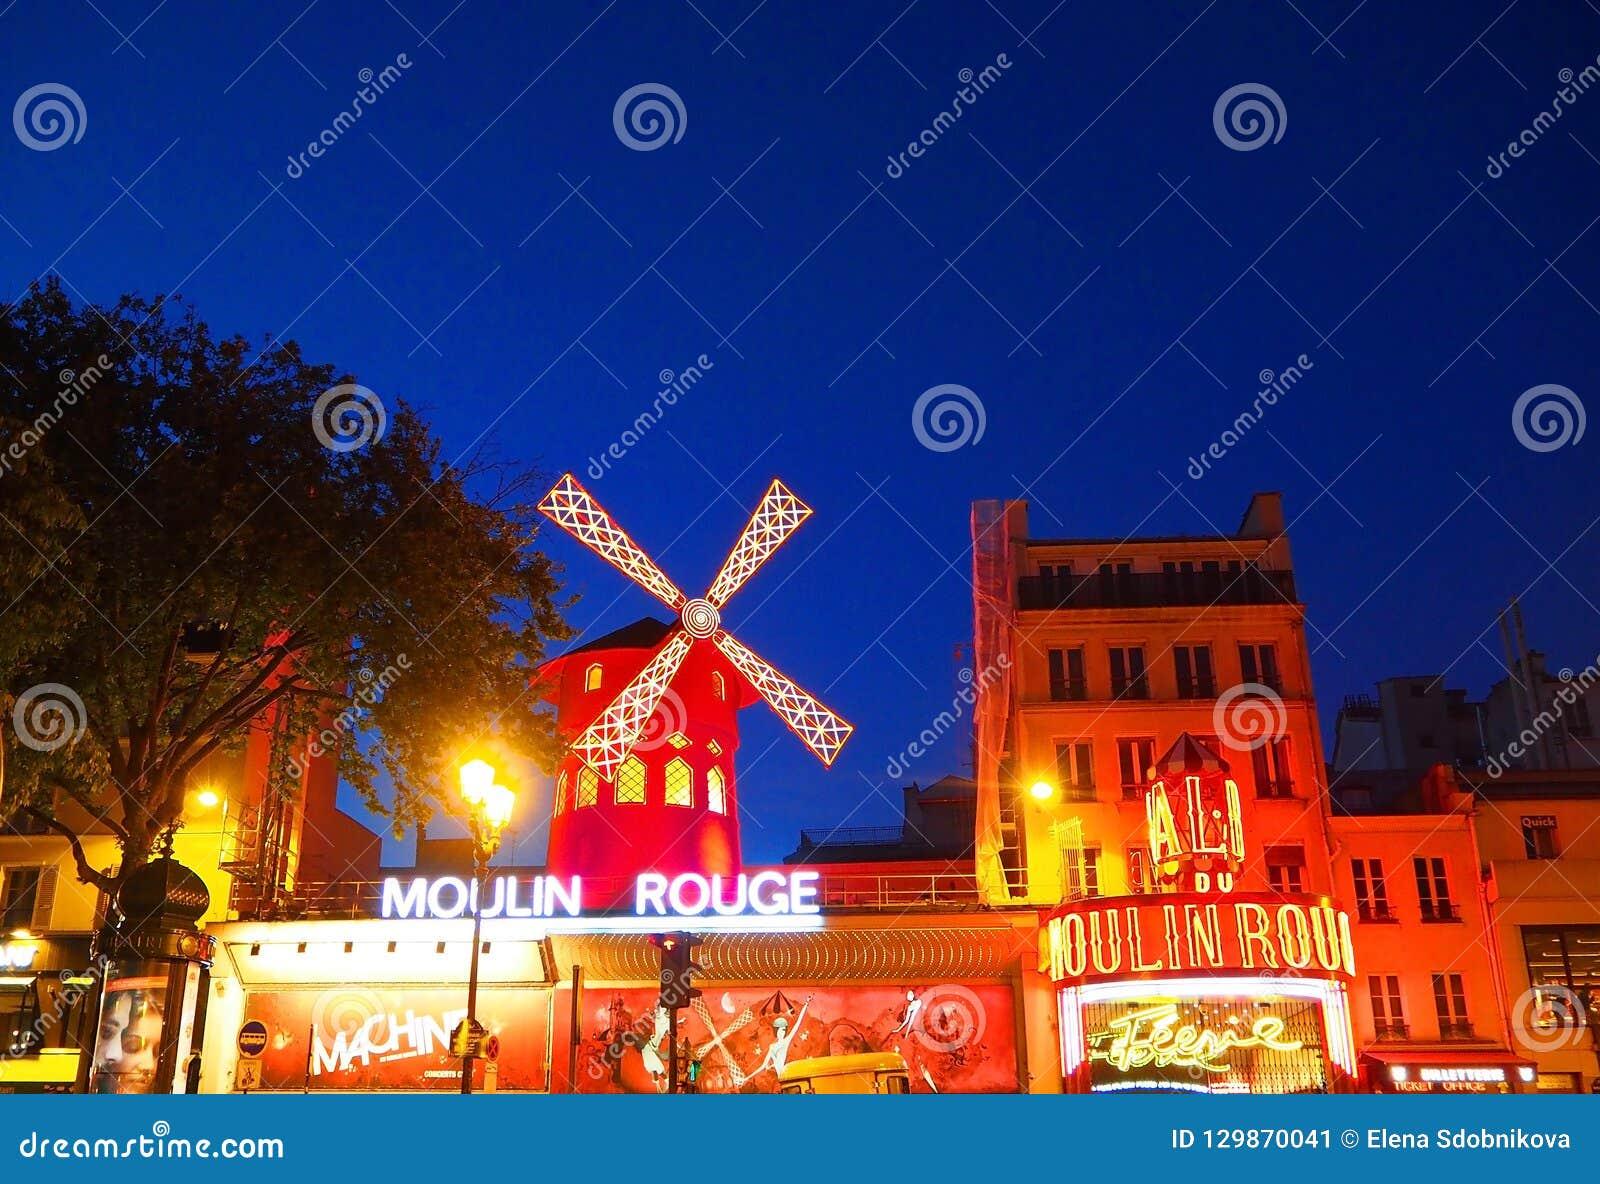 Paris Francia Abril De 2017 Vista Del Molino Rojo De Moulin